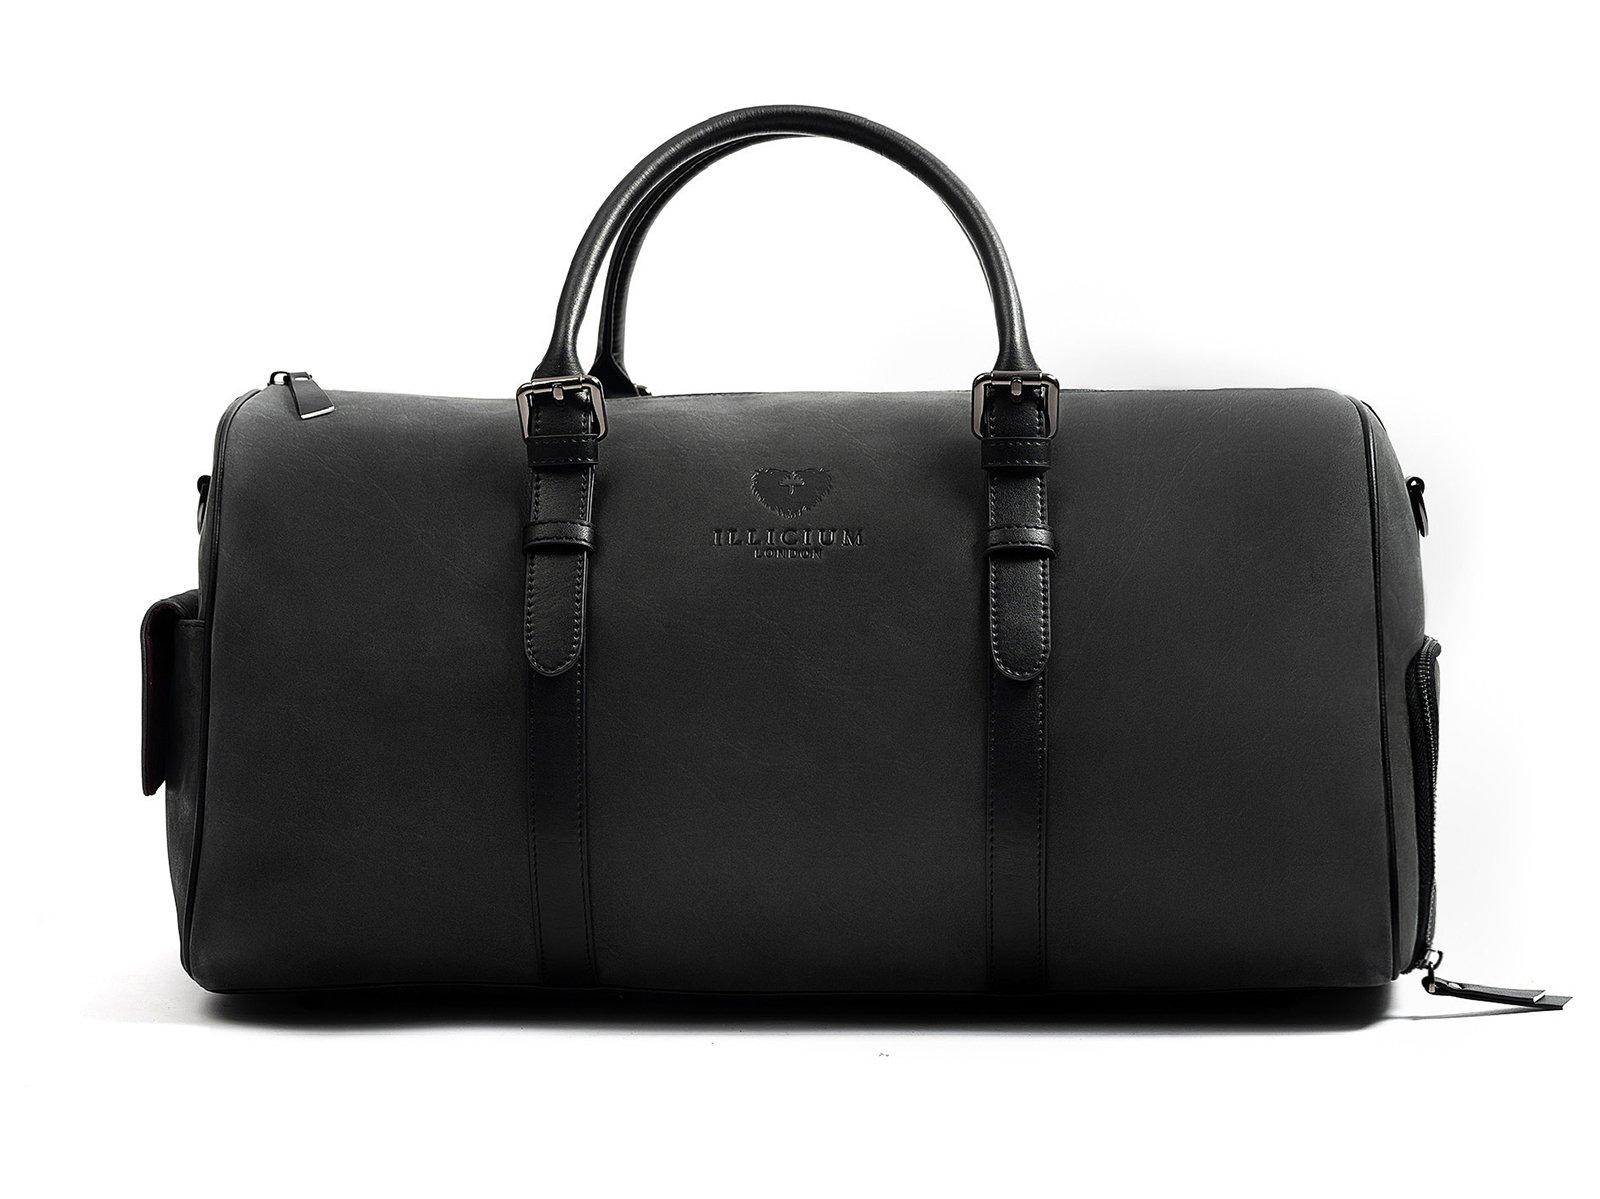 kingshood leather duffle bag